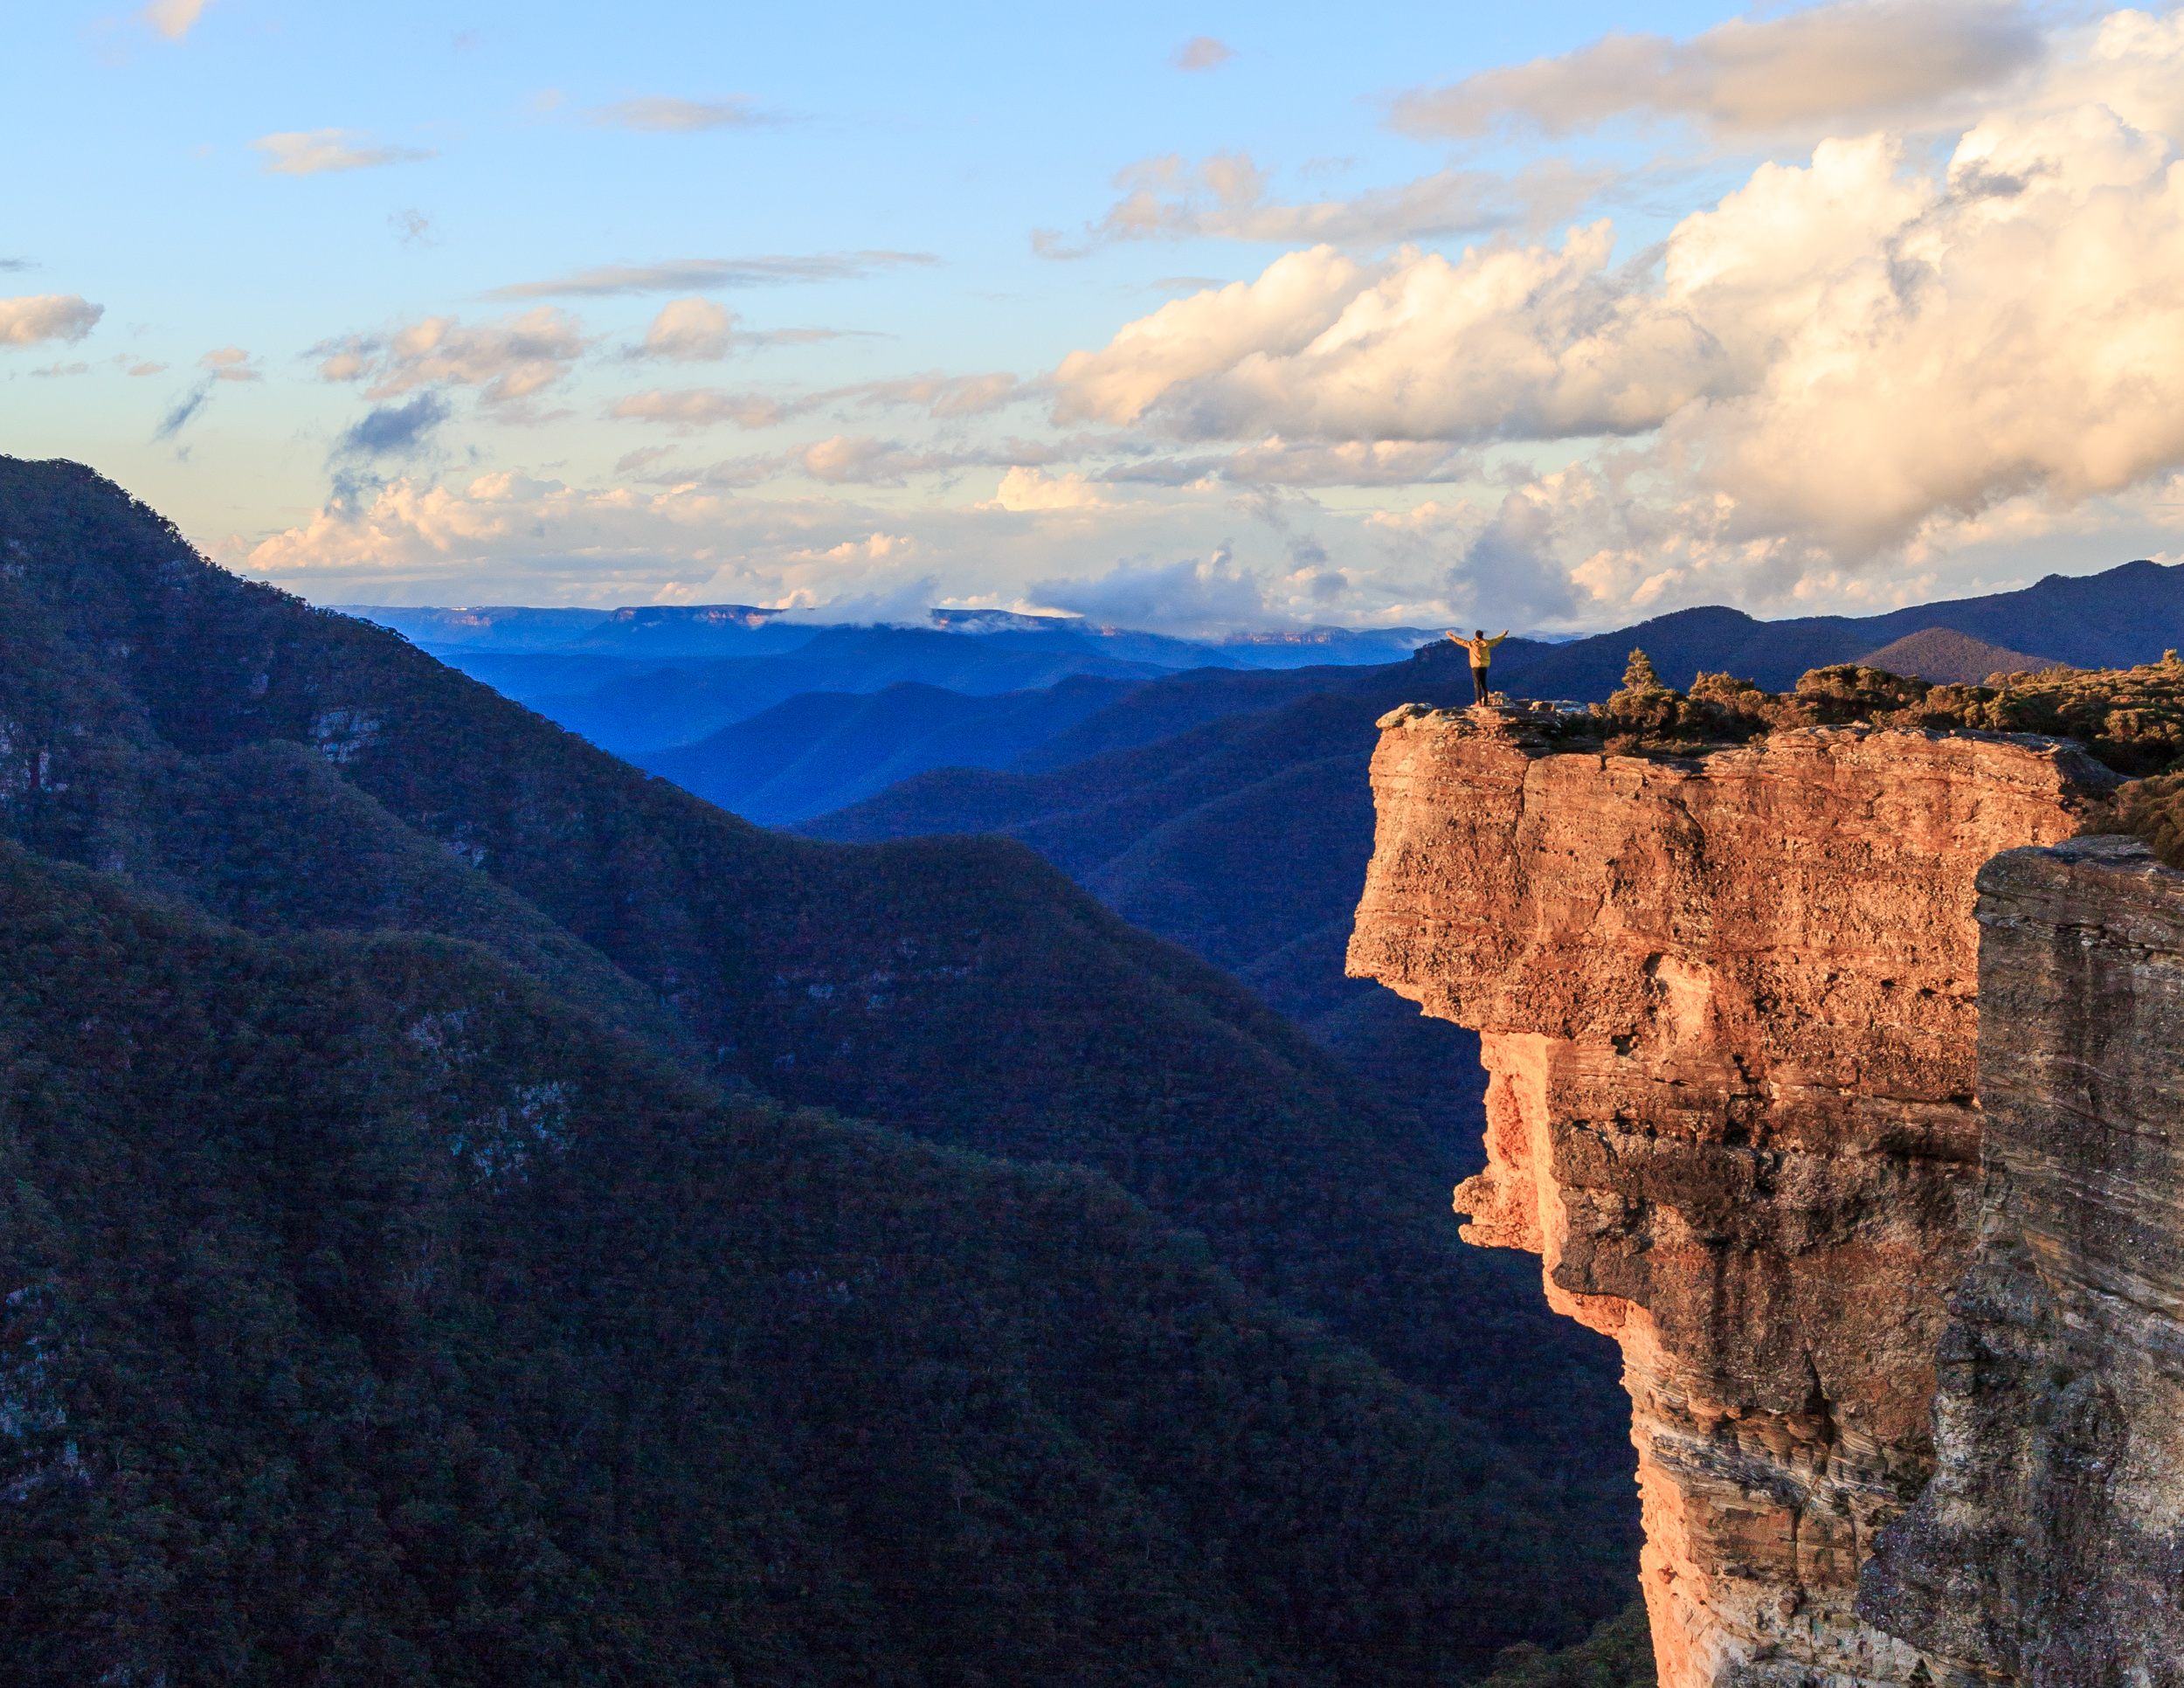 Kanangra-Boyd National Park